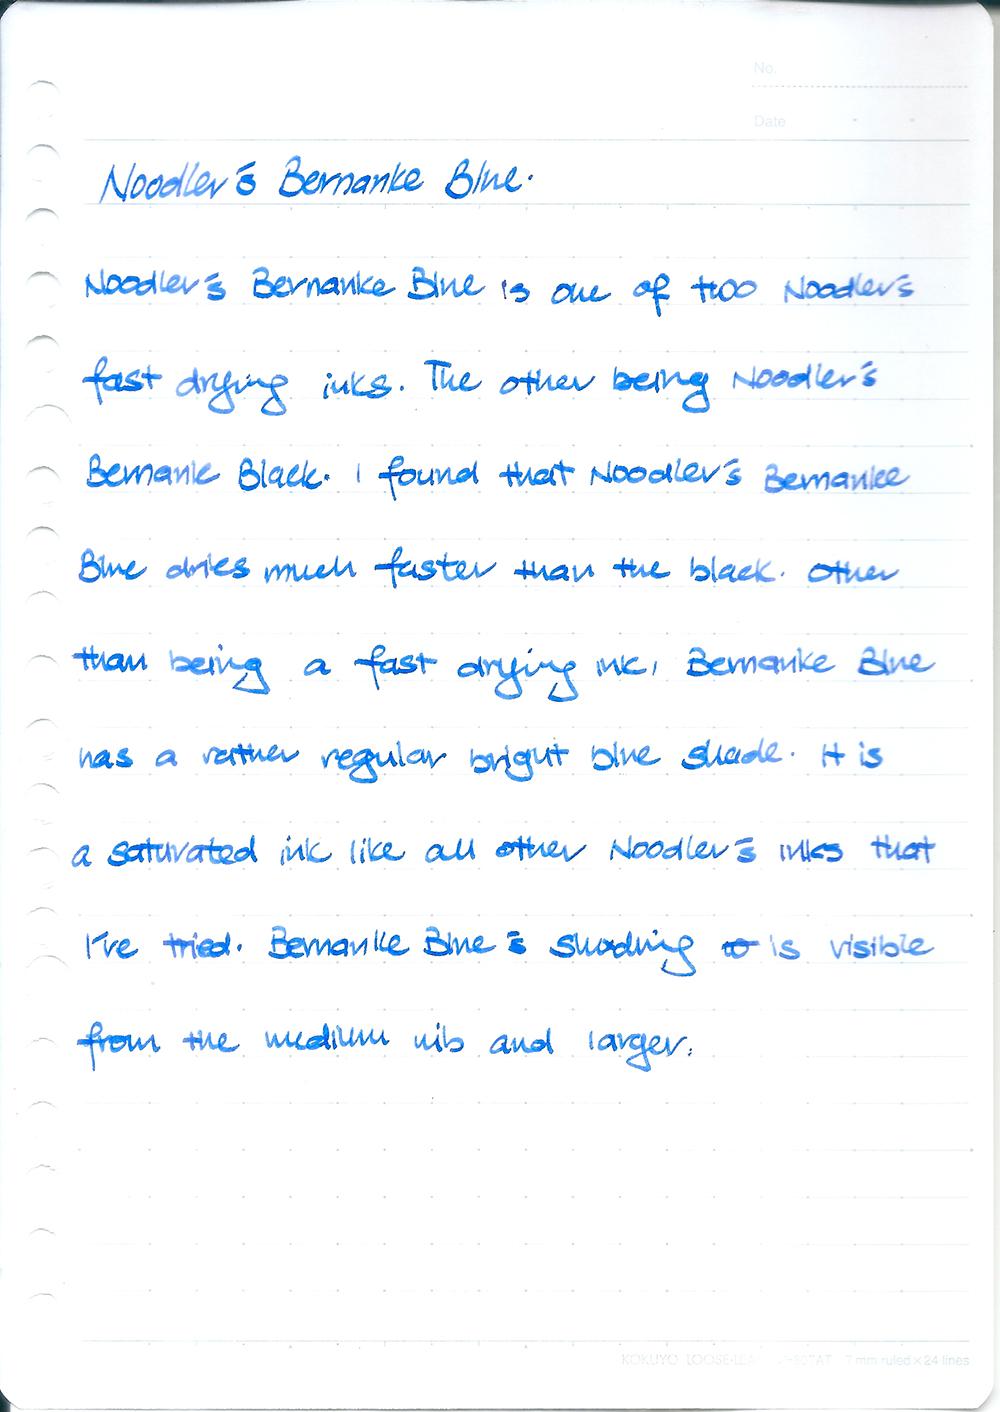 Noodler's Bernanke Blue 2.jpg